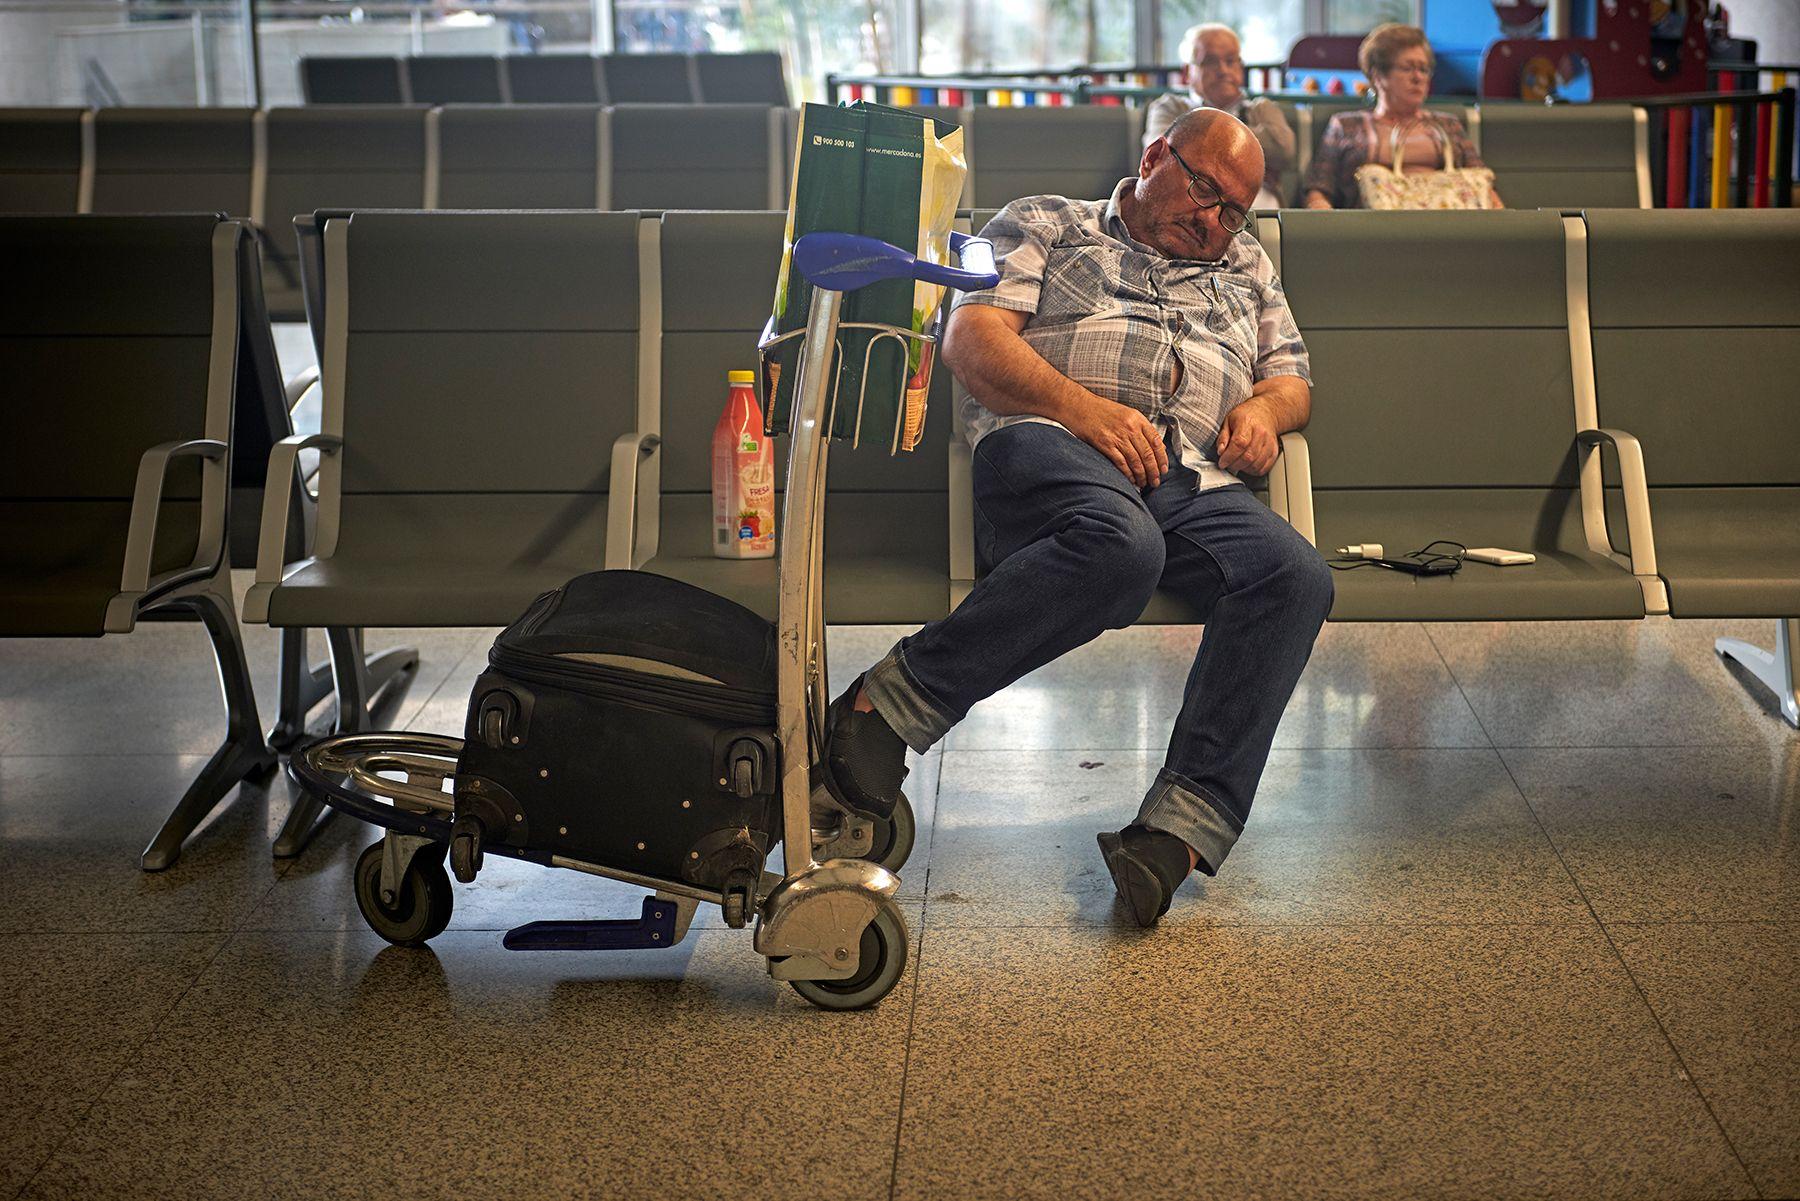 Aeropuertos 18 -jet lag-